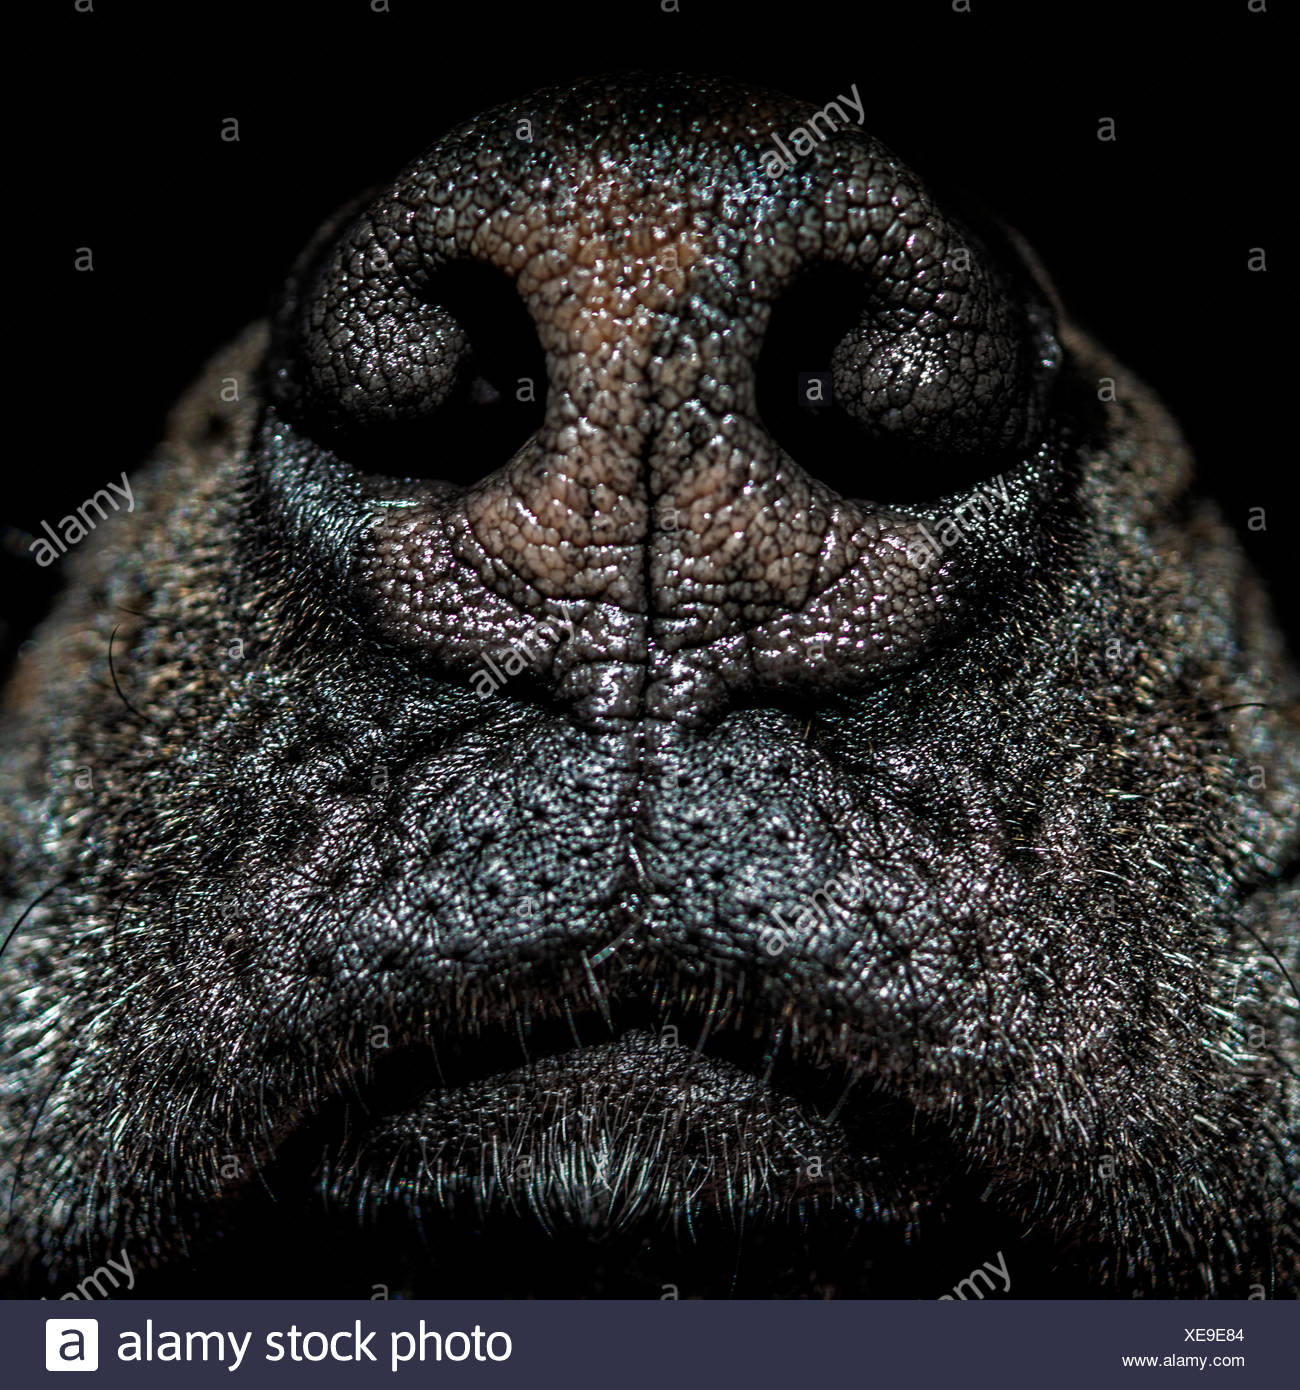 Close up of dog's nose Photo Stock